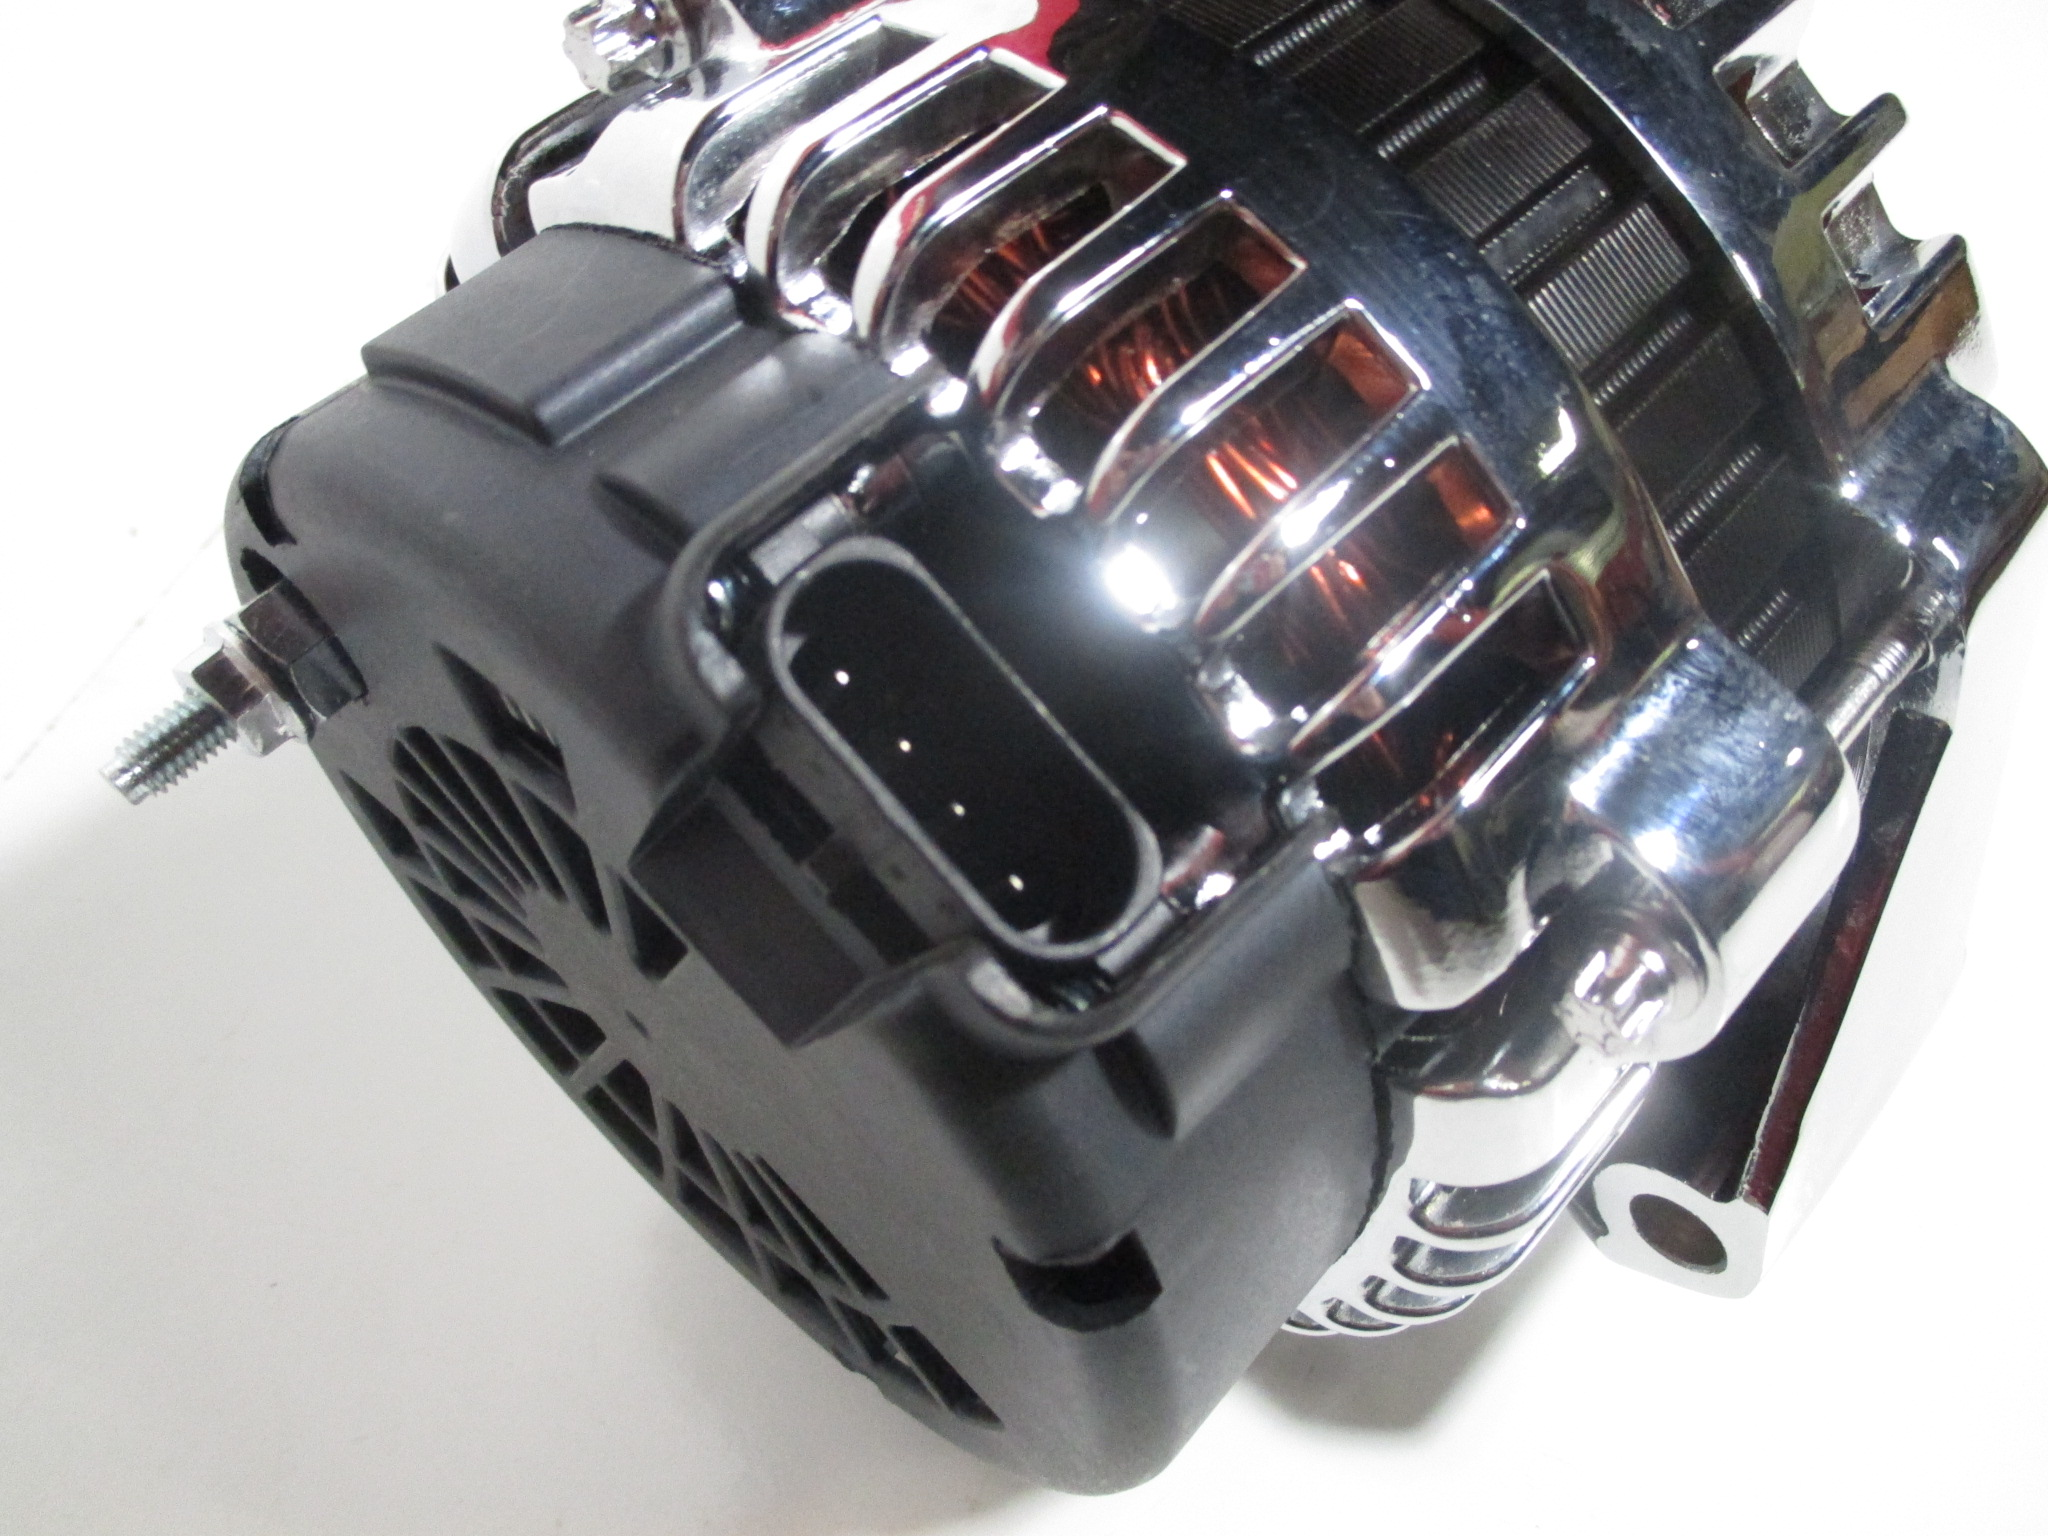 High Output Gm Alternator F Body Ls1 Or Trucks 180 Amp Chrome Gauge Wiring Cs130d Style